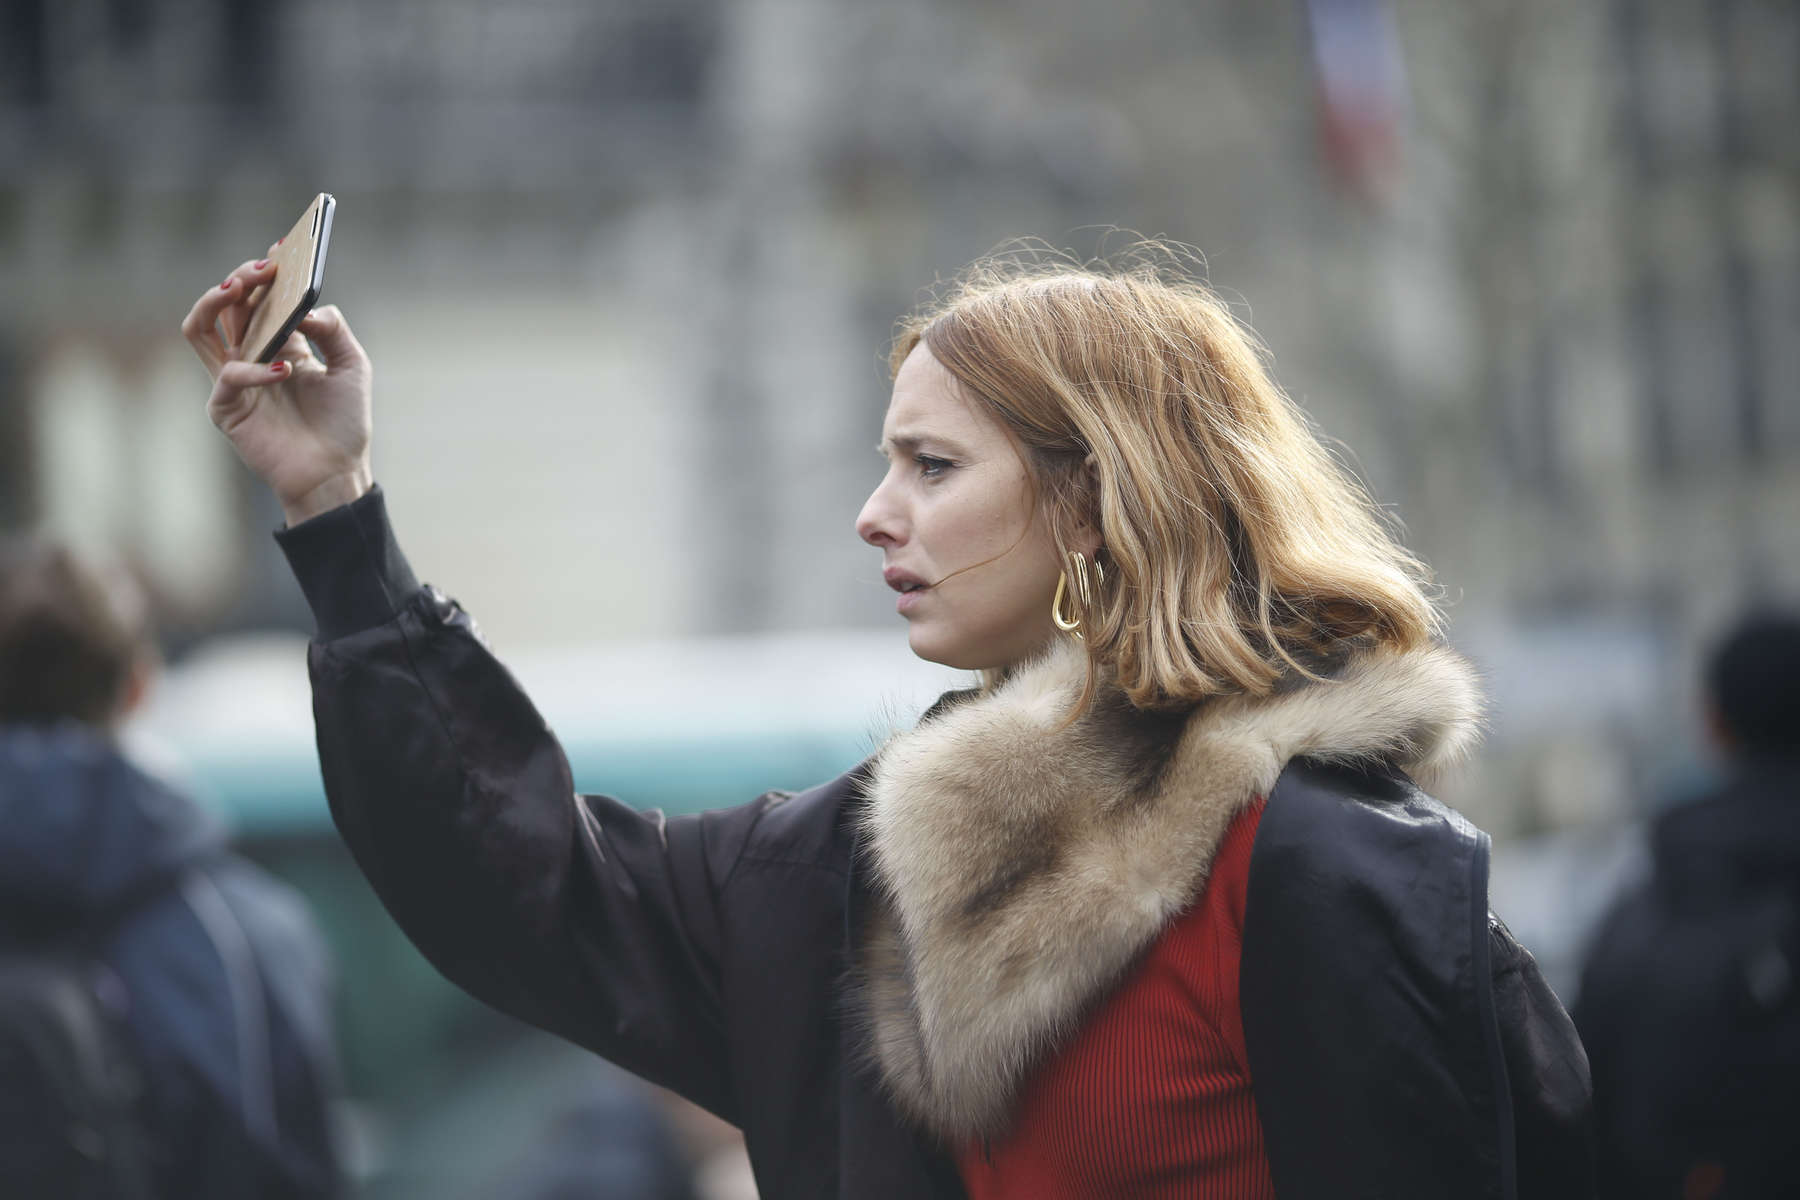 Candela Novembre - Paris Fashion Week, March 2016